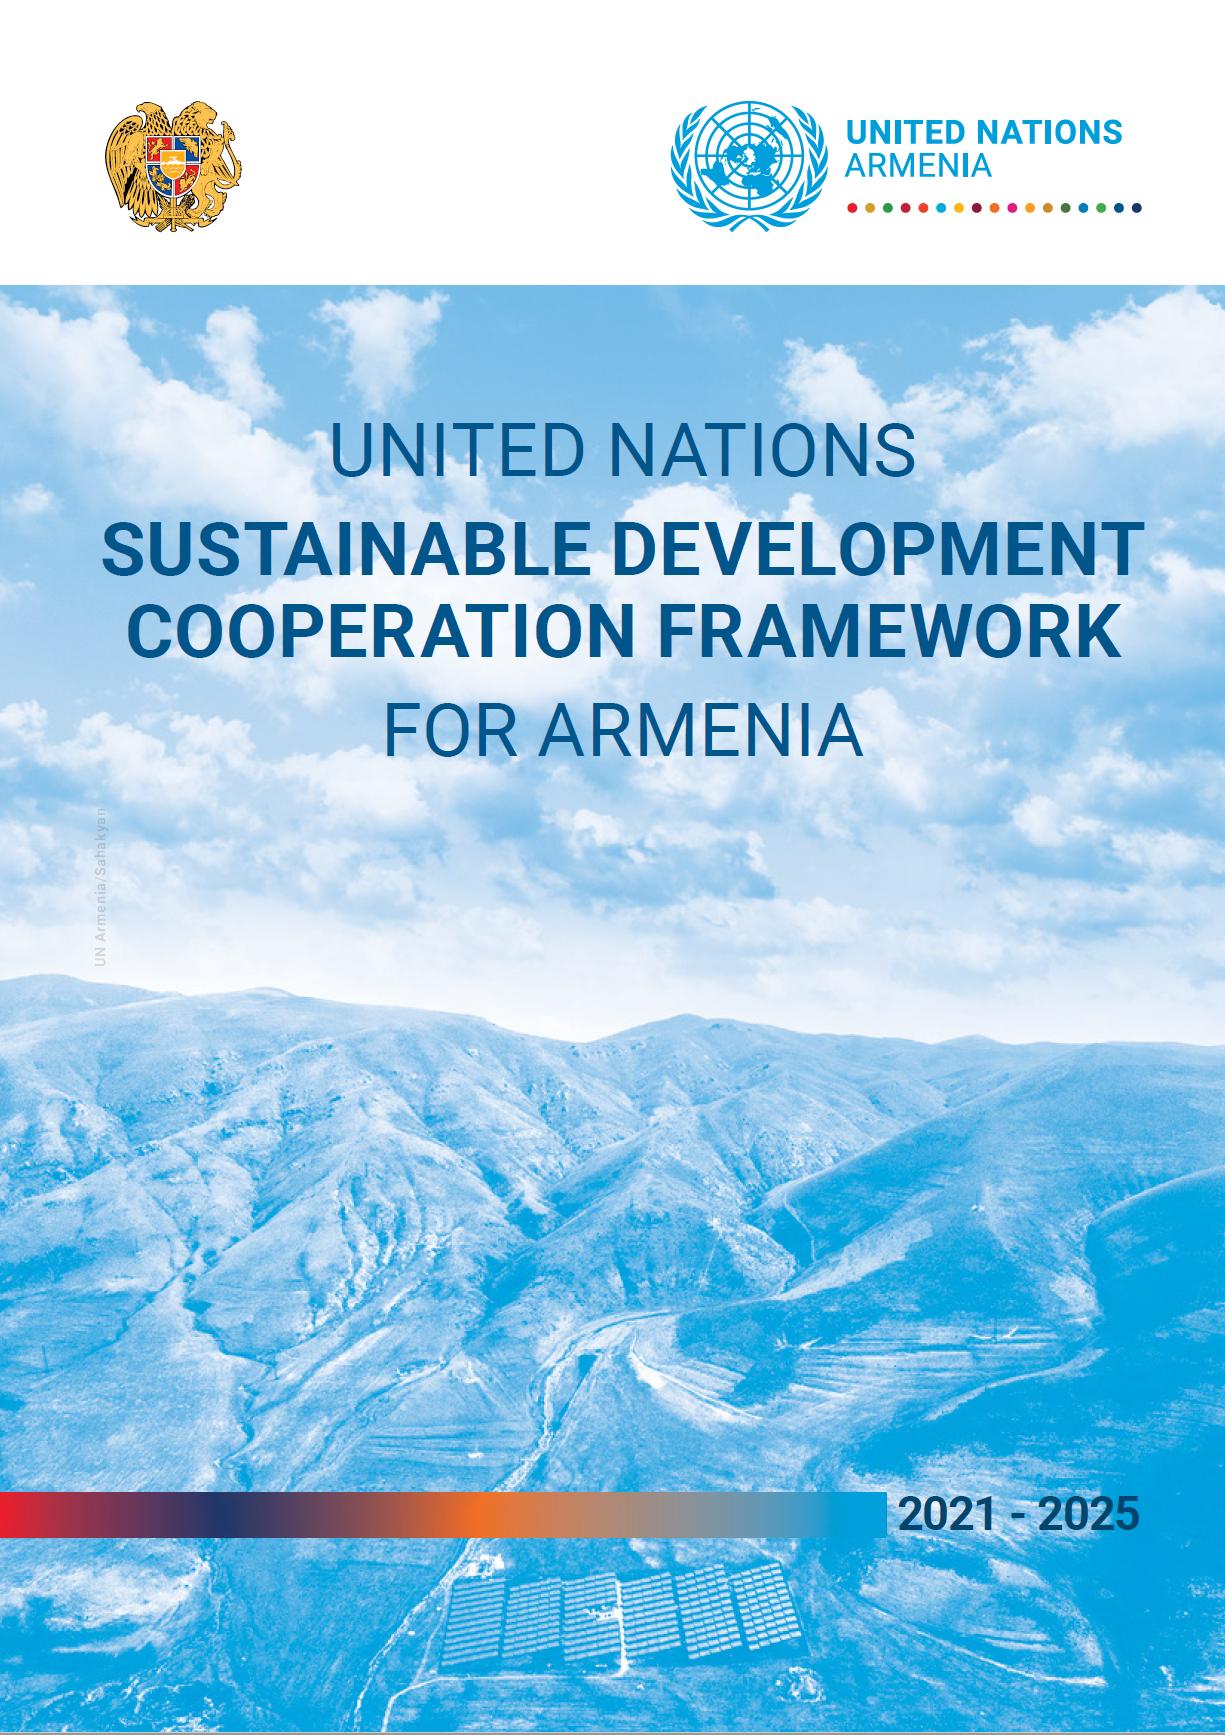 2021-2025 Cooperation Framework cover